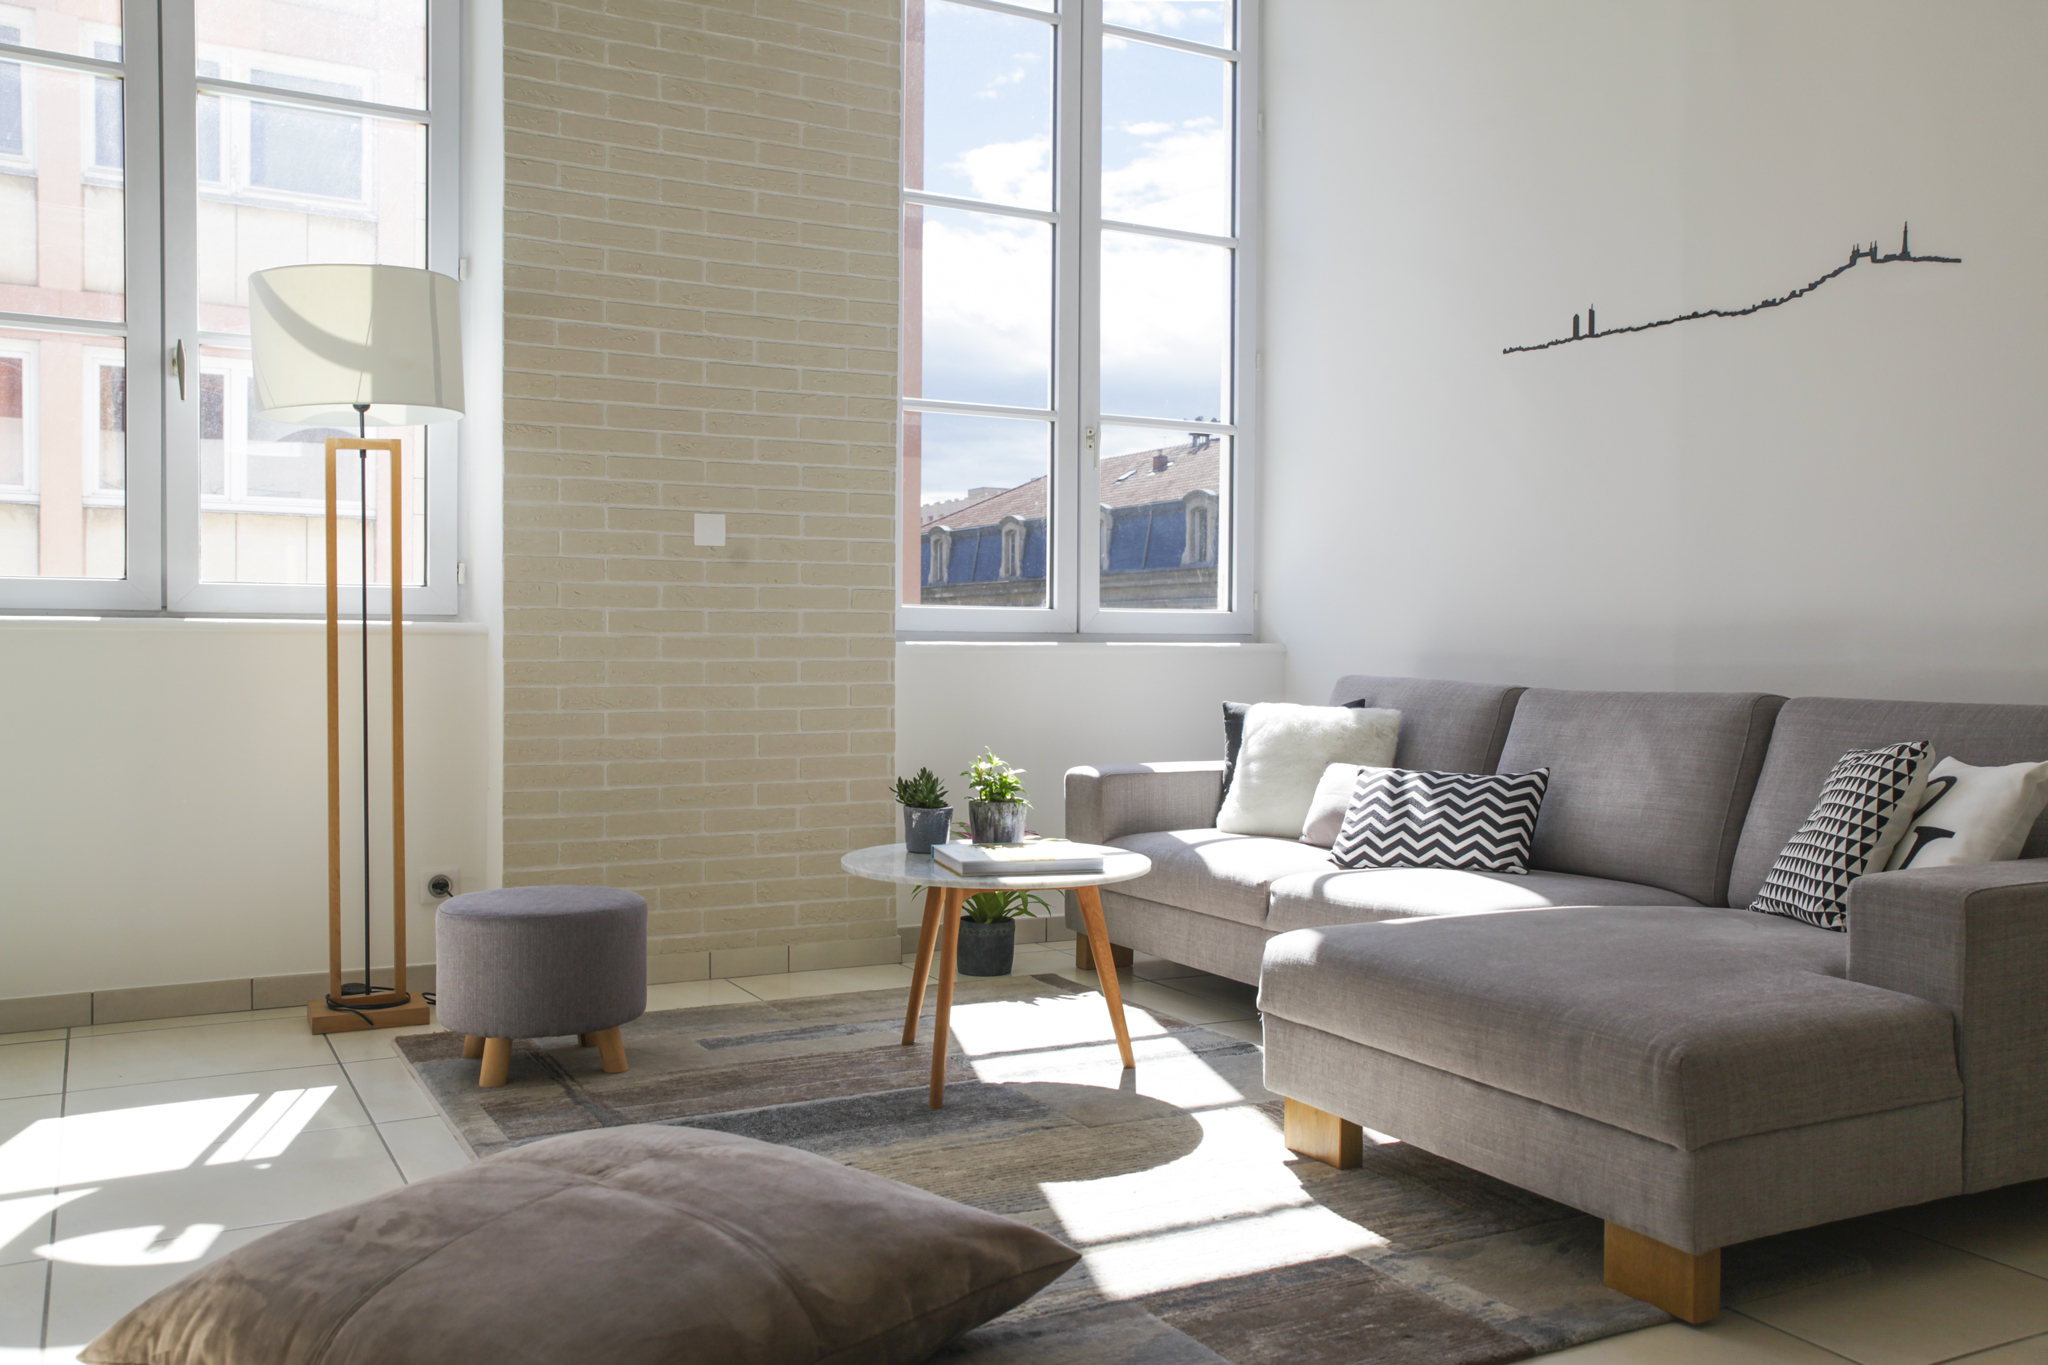 bumper-immobilier-appartement-vente-achat-investir-pret-courtier-lyon-69006-chambre-massena-foch-renove-0.jpg